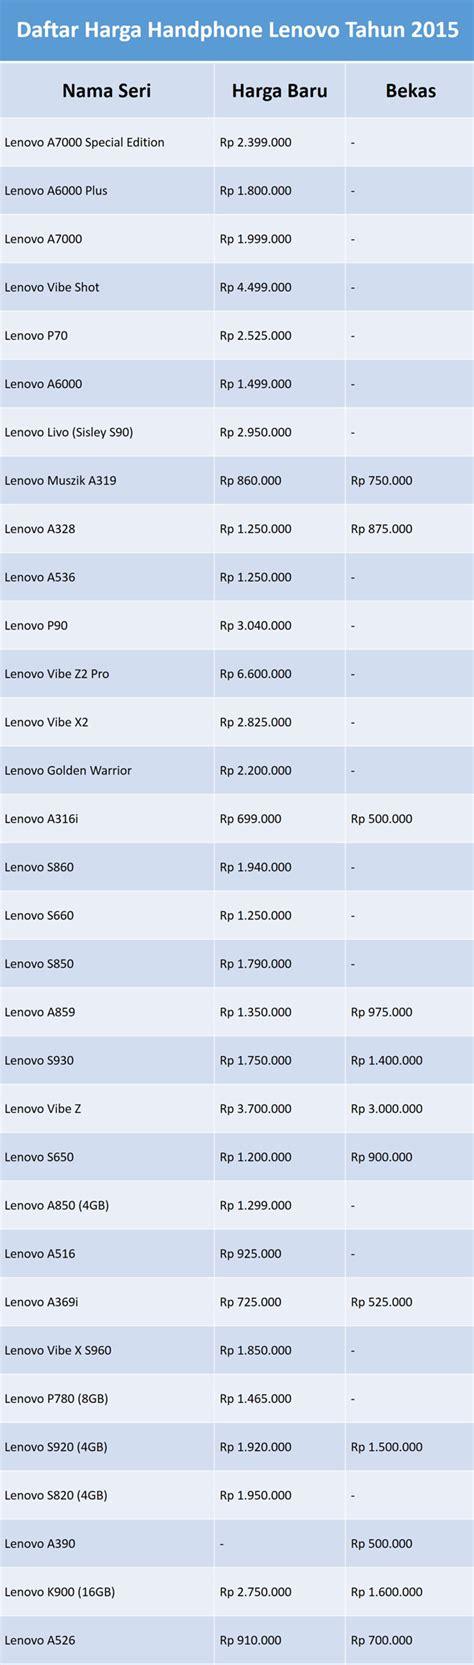 Handphone Vivo Di Indonesia informasi harga handphone 2015 the knownledge